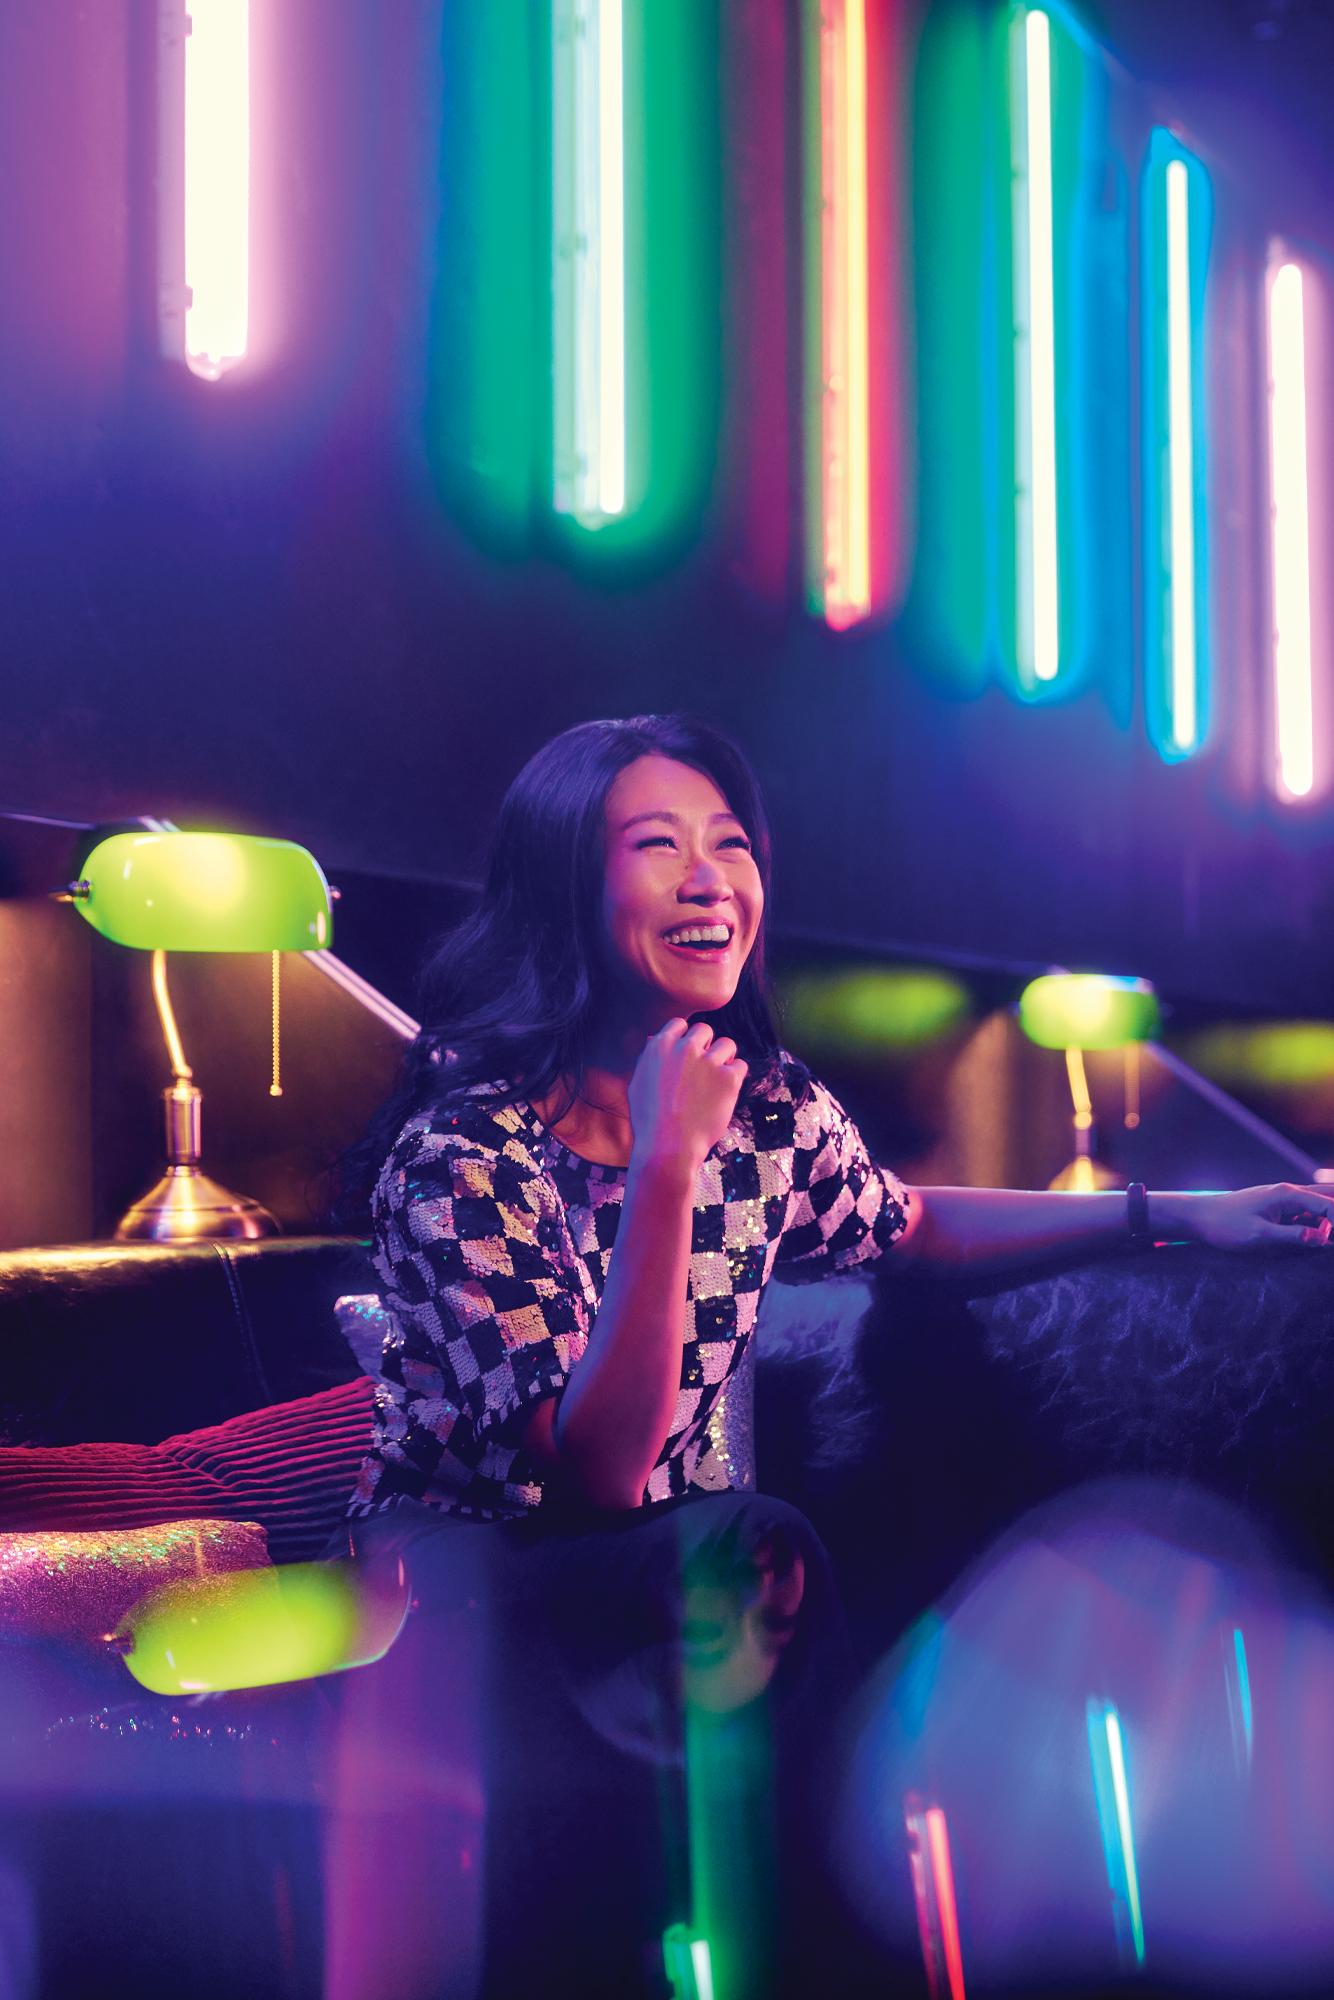 Karen Tan Turns Abandoned Nightclub Into Singapore's First Socially-Distanced Pop-Up Cinema